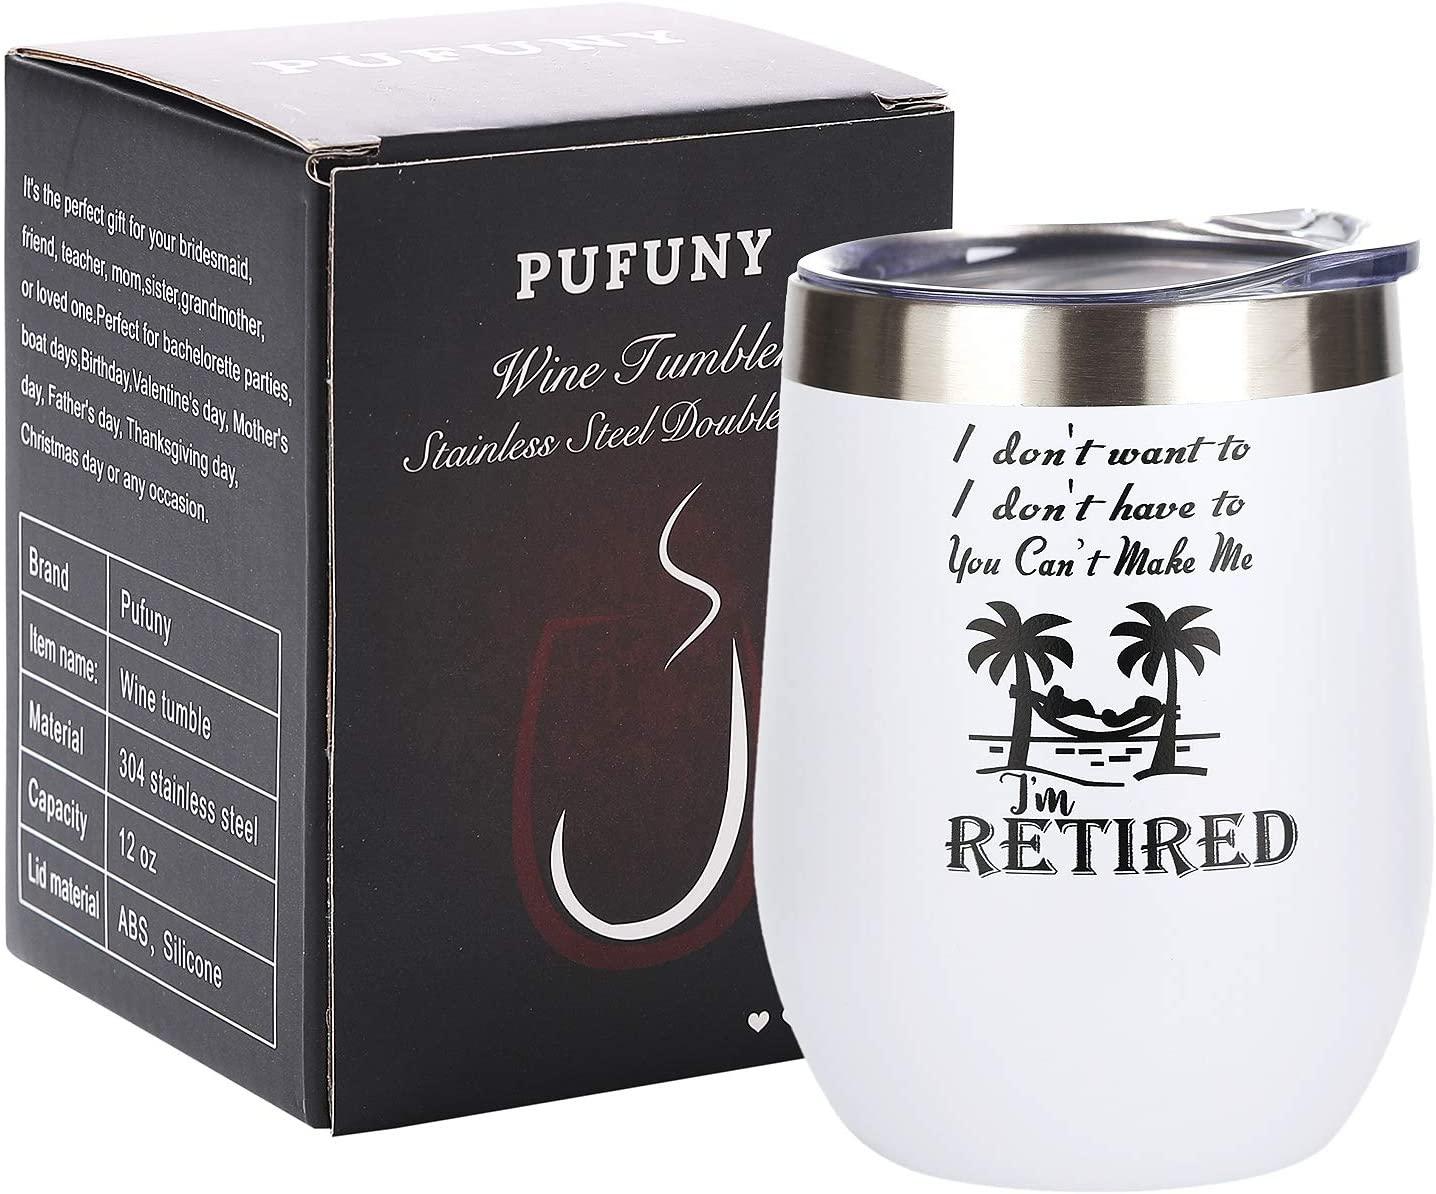 Pufuny I Don't Want To I Don't Have To You Can't Make Me I'm Retired Wine Glass Tumbler,Funny Retirement Gifts for Women,Retiring Teachers,Best Friends,Coworkers,Nurses,Retired Gifts 12 oz White